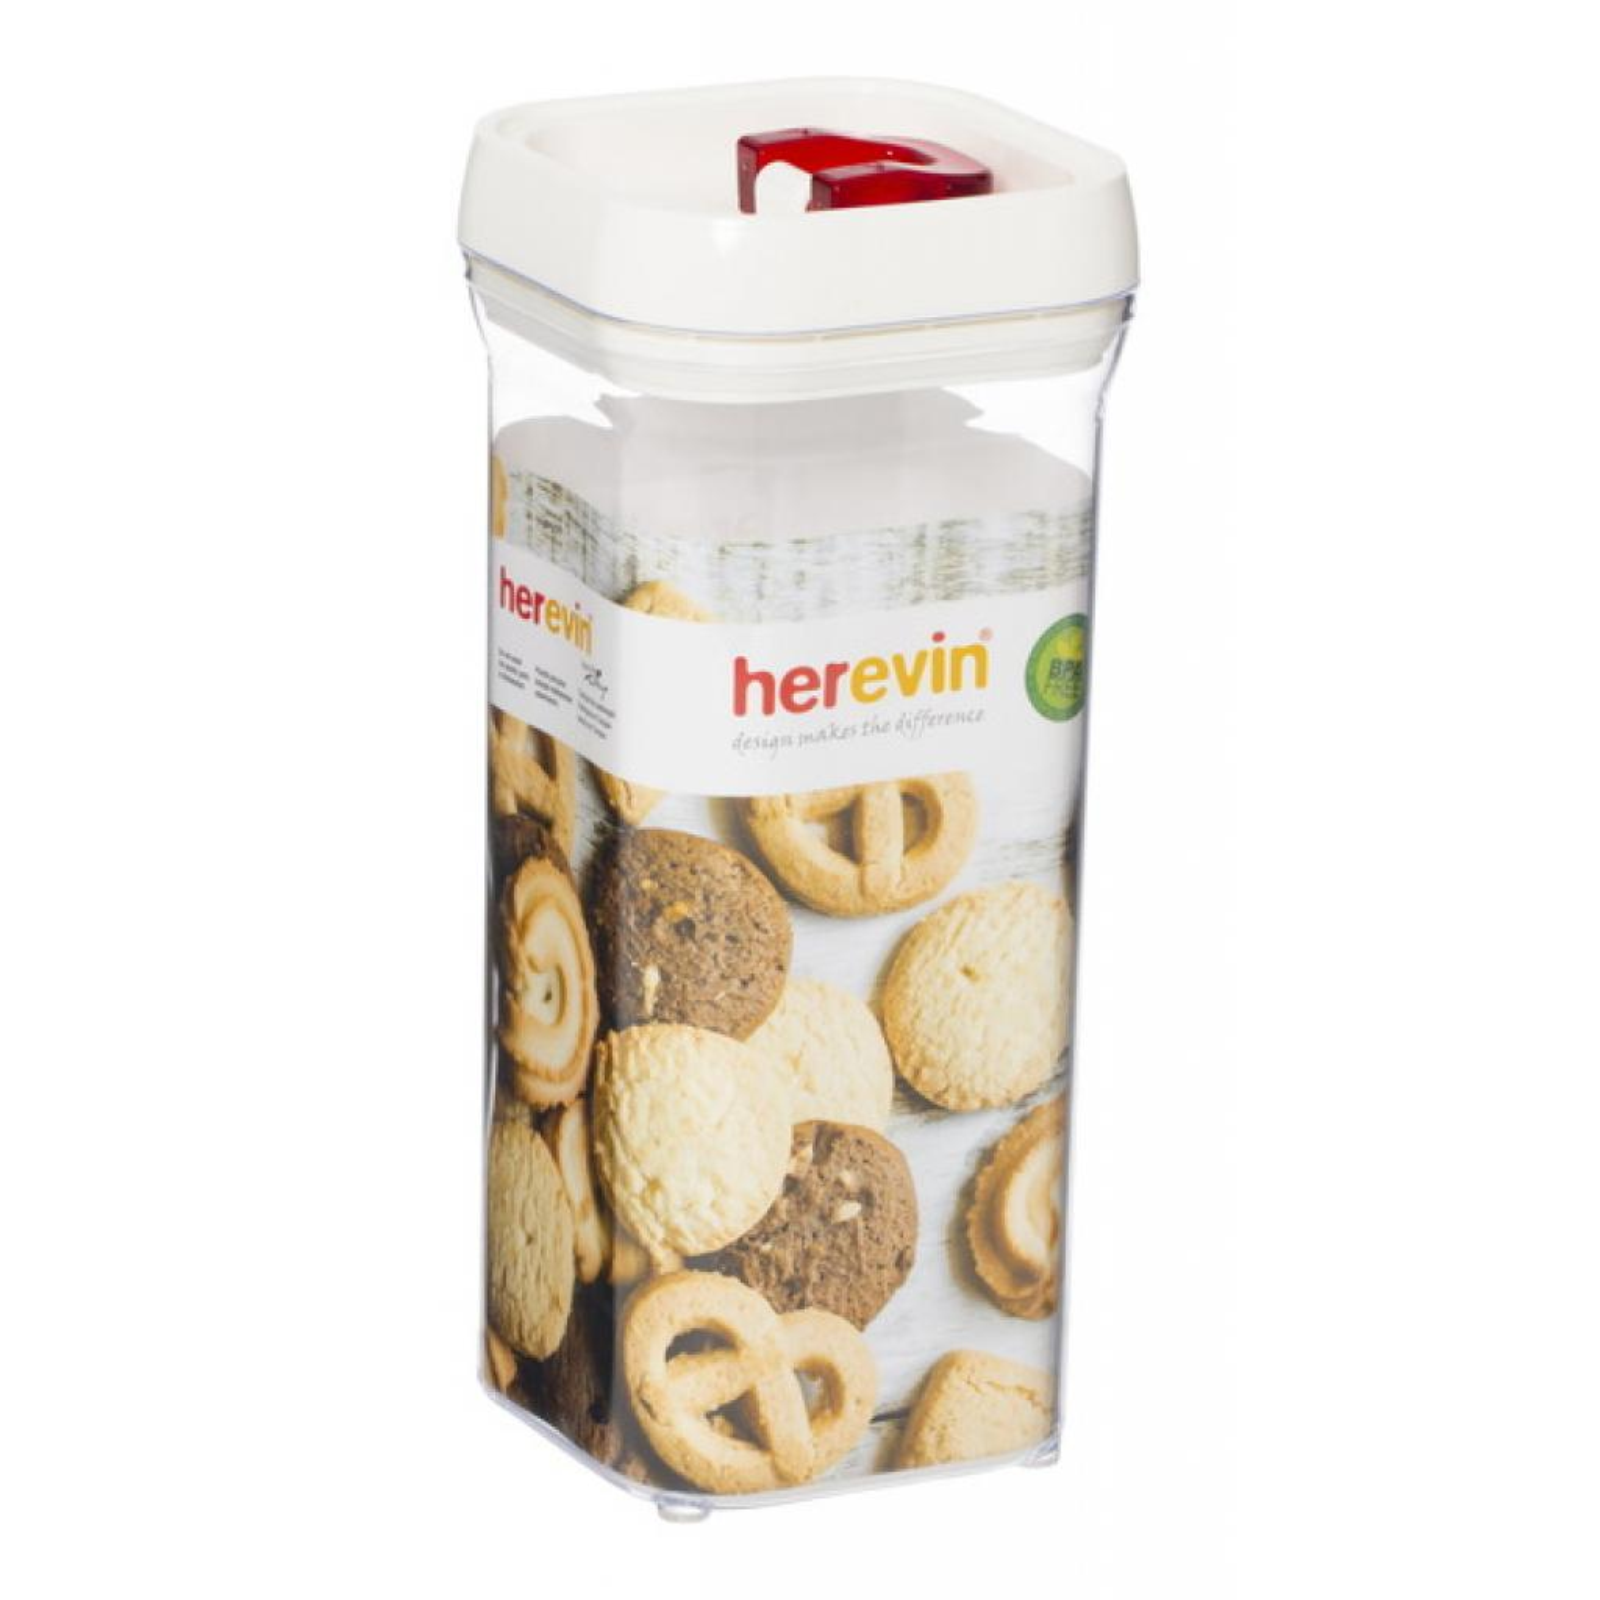 Пищевой контейнер Herevin Red 1.5 л (161203-001)